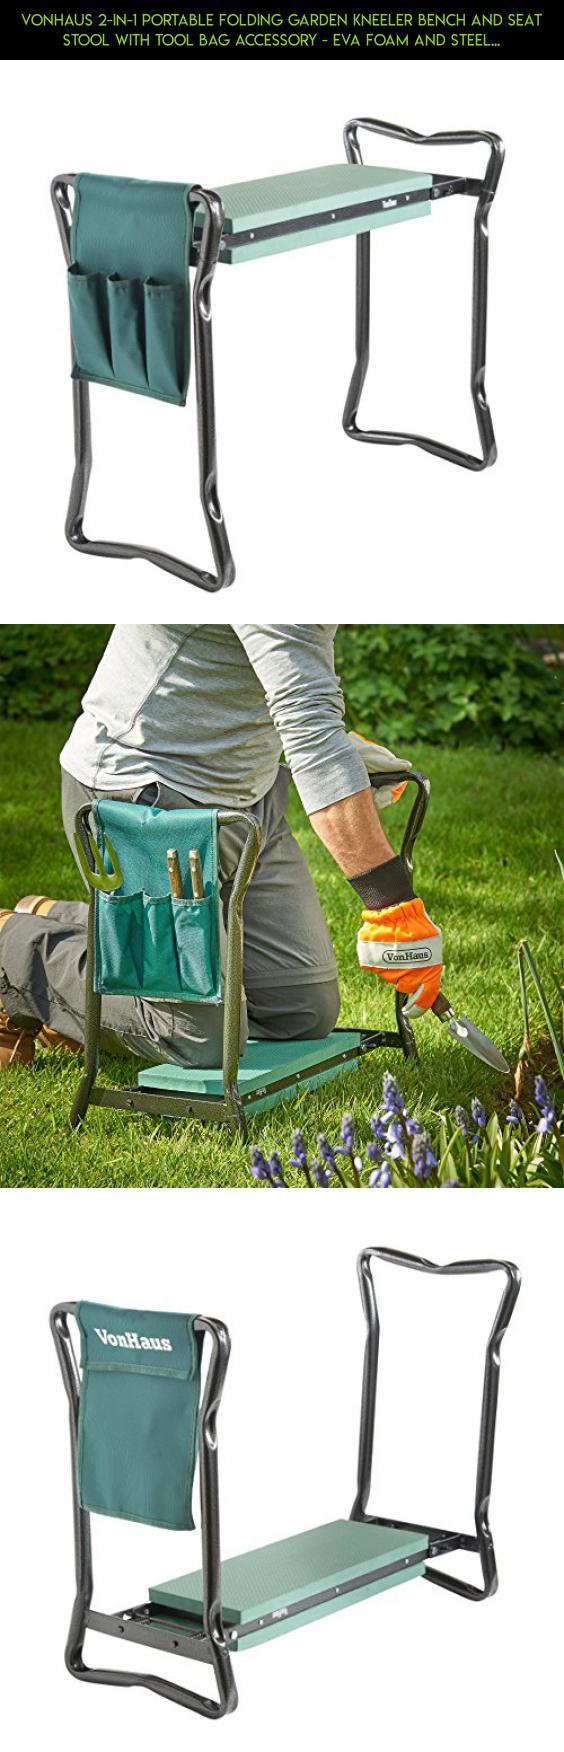 garden gardening chair furniture disabled nottingham arthritis stool charity bristol